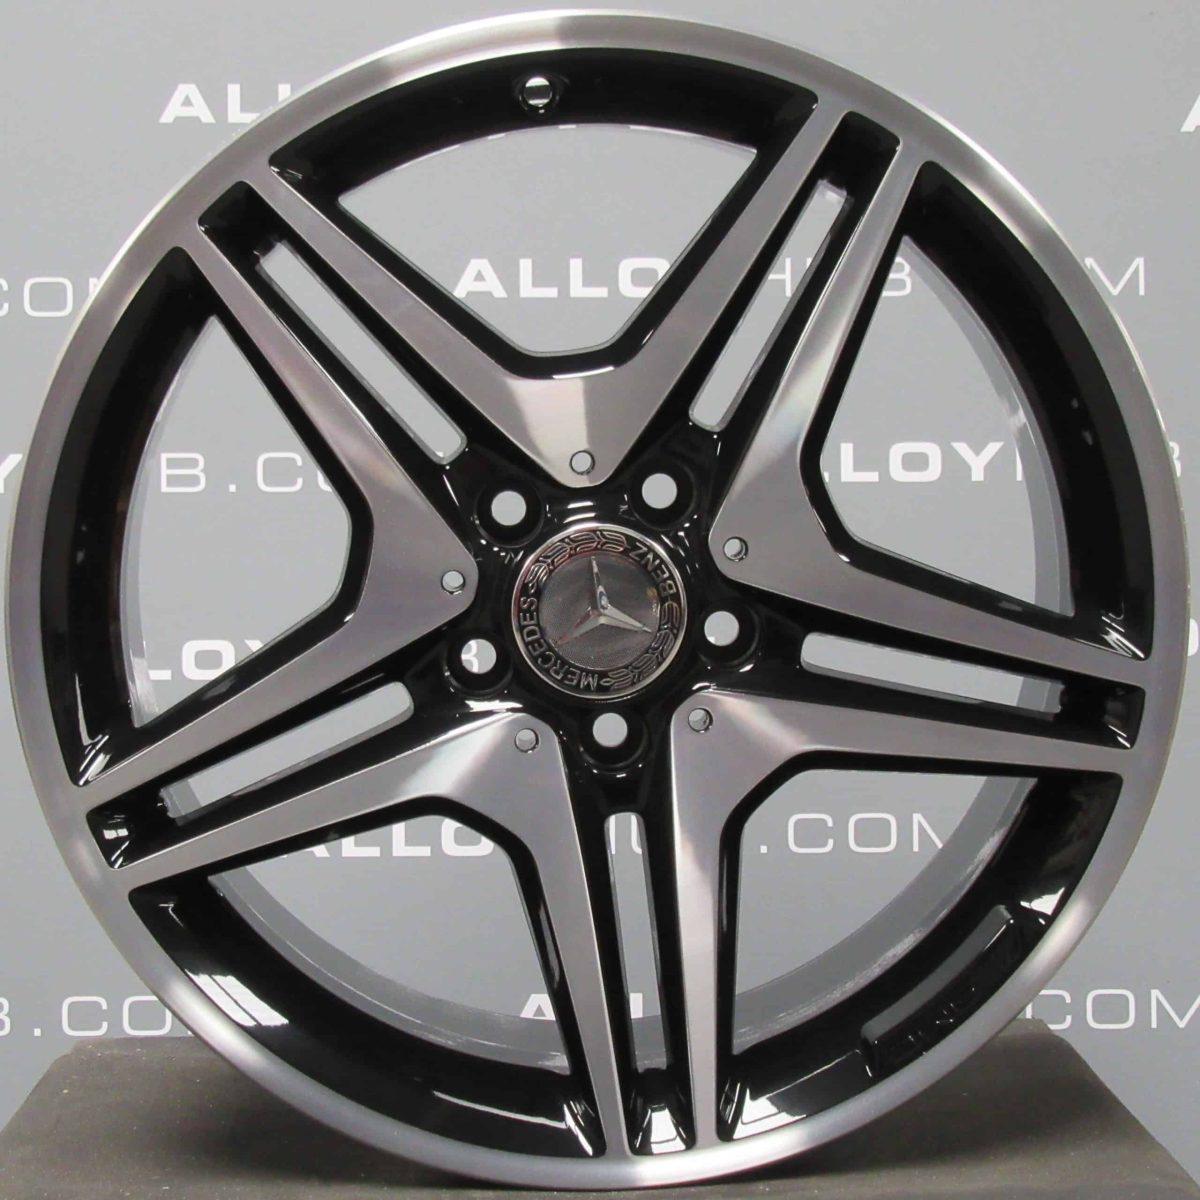 "Genuine Mercedes-Benz A/B Class W176 W246 18"" Inch 5 Twin Spoke Alloy Wheels with Black & Diamond Turned Finish A1764010302"